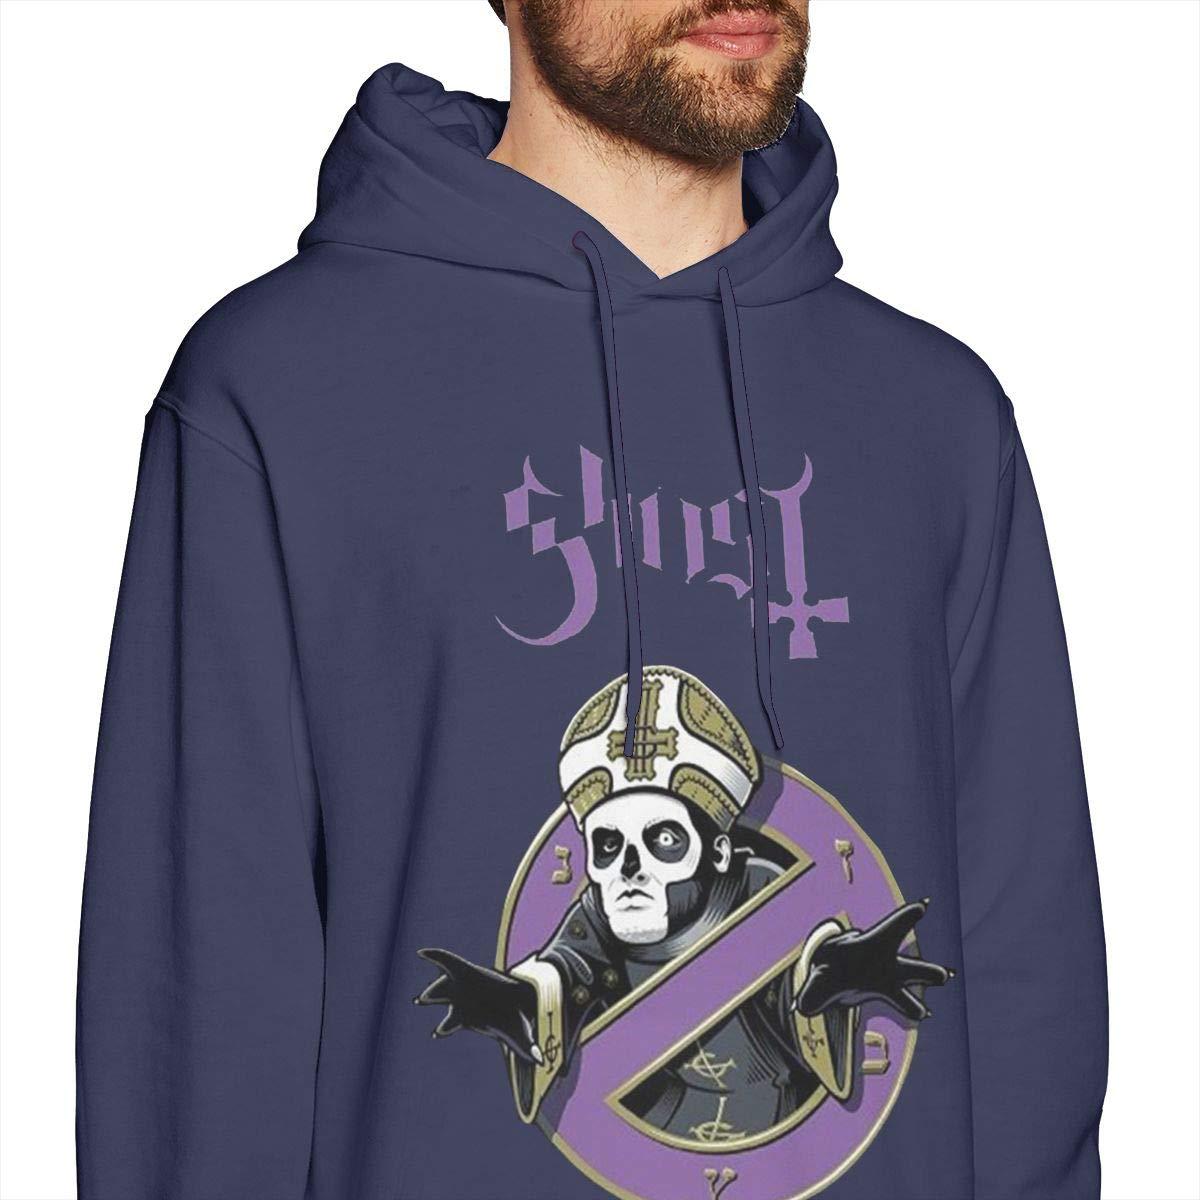 Mens Hooded Sweatshirt Ghost with The Bands Logo Original Retro Literary Design Navy